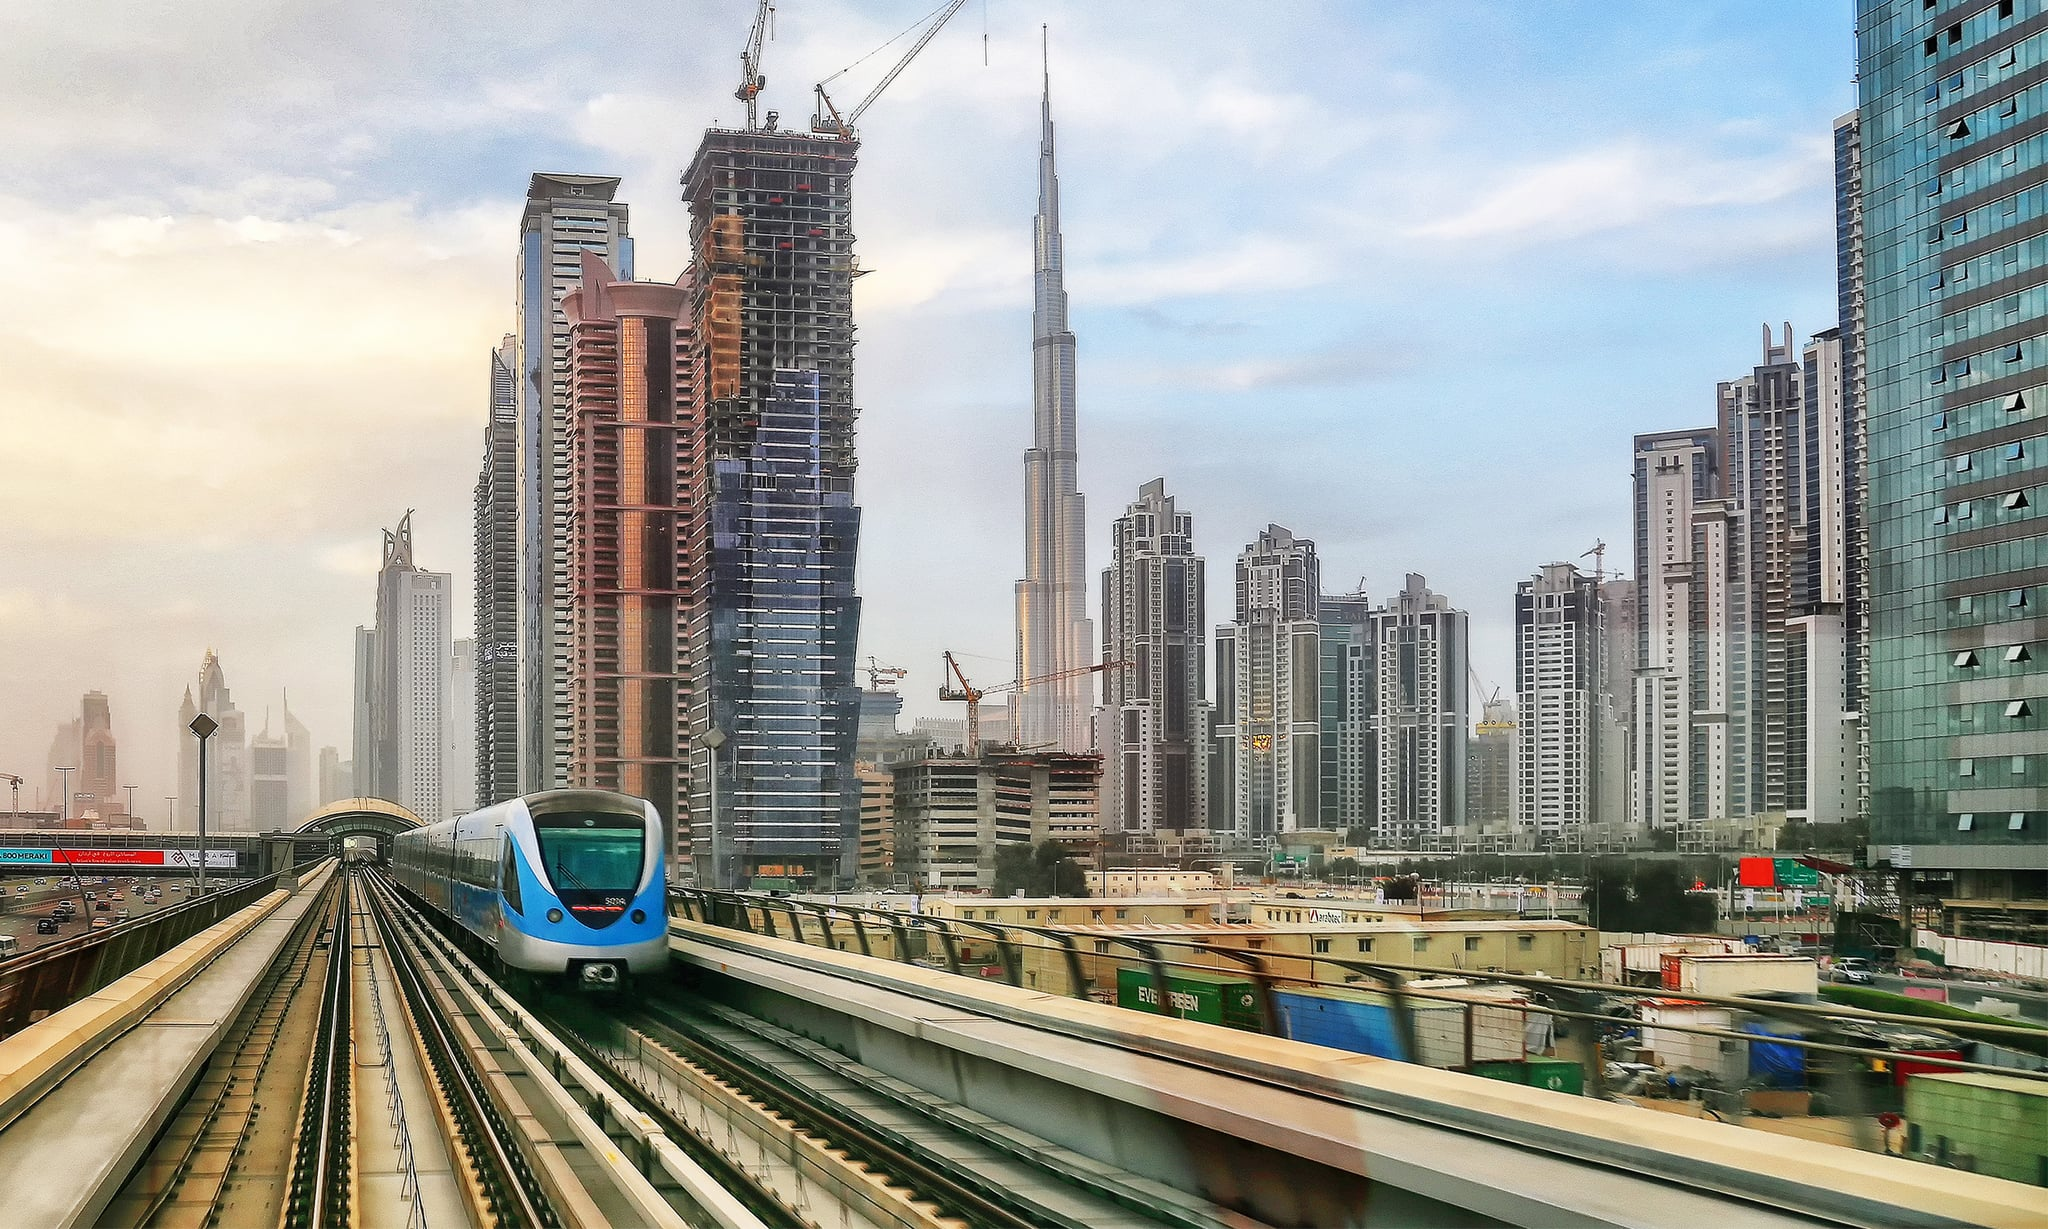 HH Sheikh Mohammed bin Rashid Al Maktoum Has Shared A Special Tweet to Celebrate the Dubai Metro's 10th Anniversary